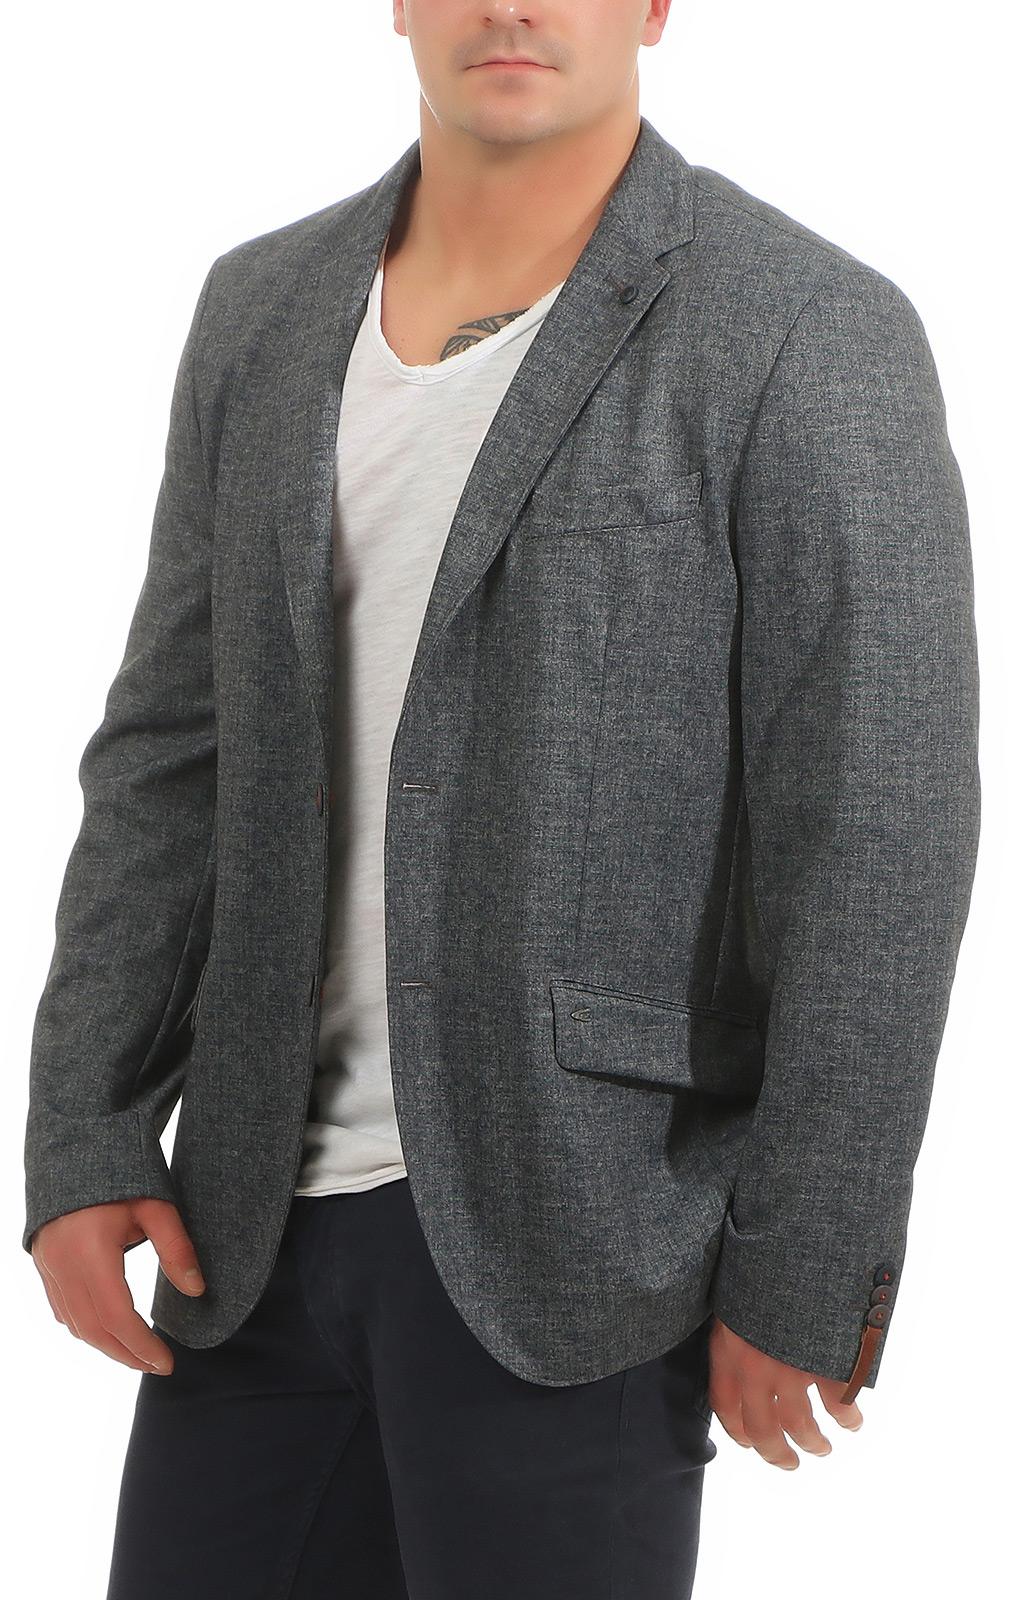 Camel Active Herren Sakko Unifarben Meliert Blazer Anzug 444125-7465